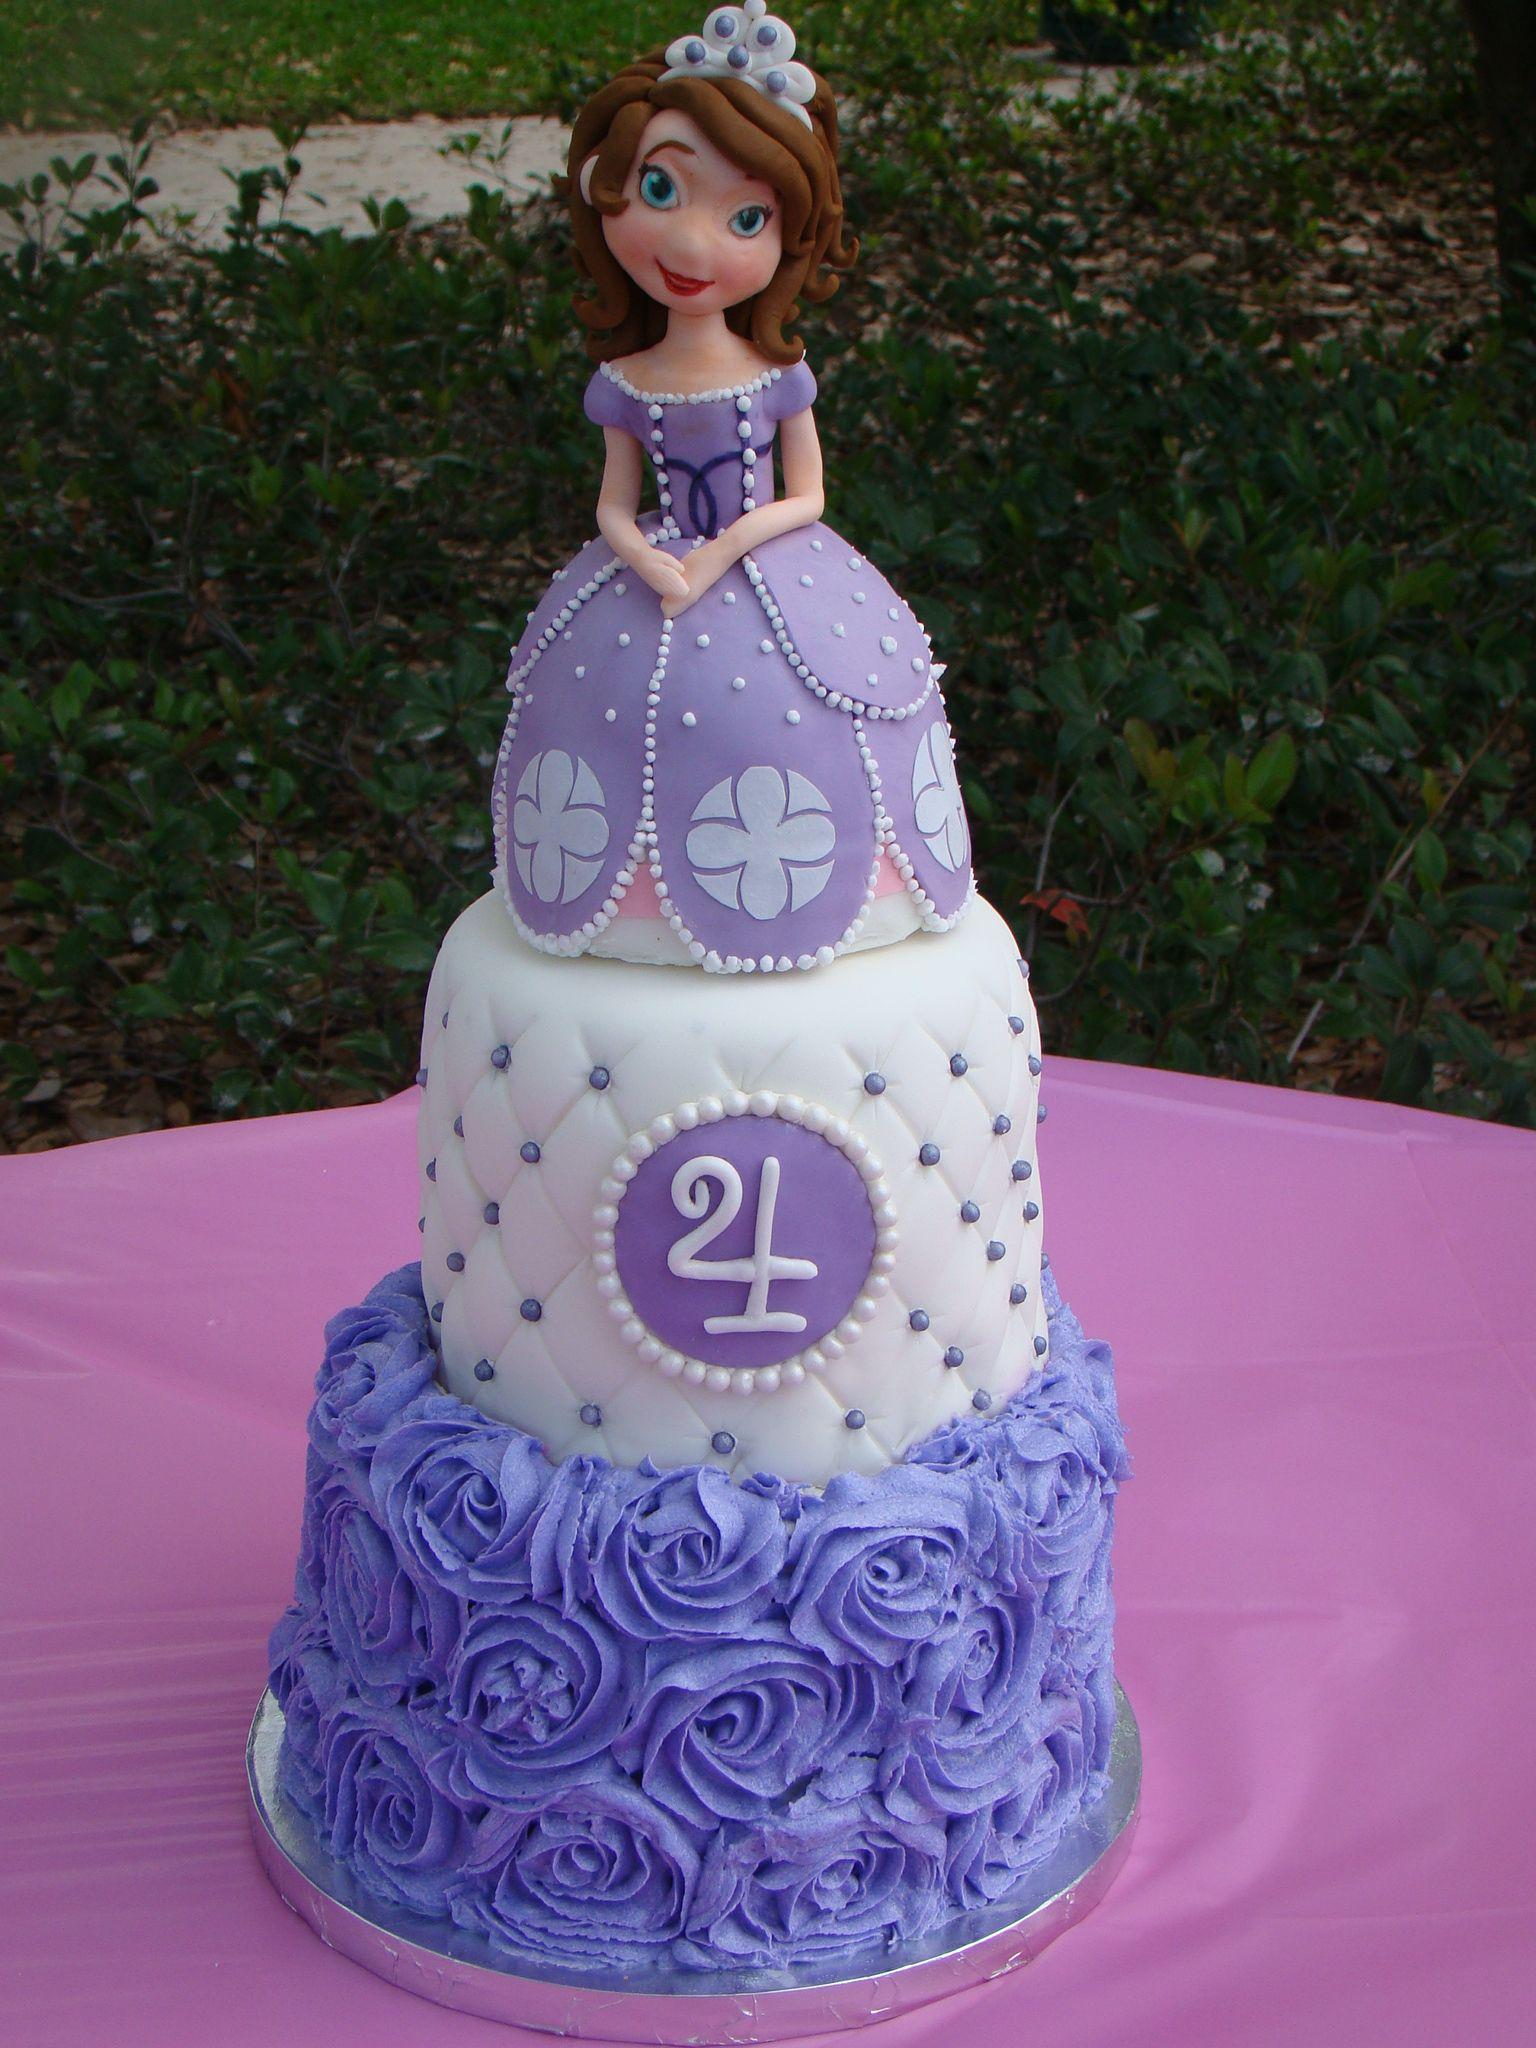 Stupendous Sofia The First Birthday Cake With Images Sofia The First Funny Birthday Cards Online Fluifree Goldxyz